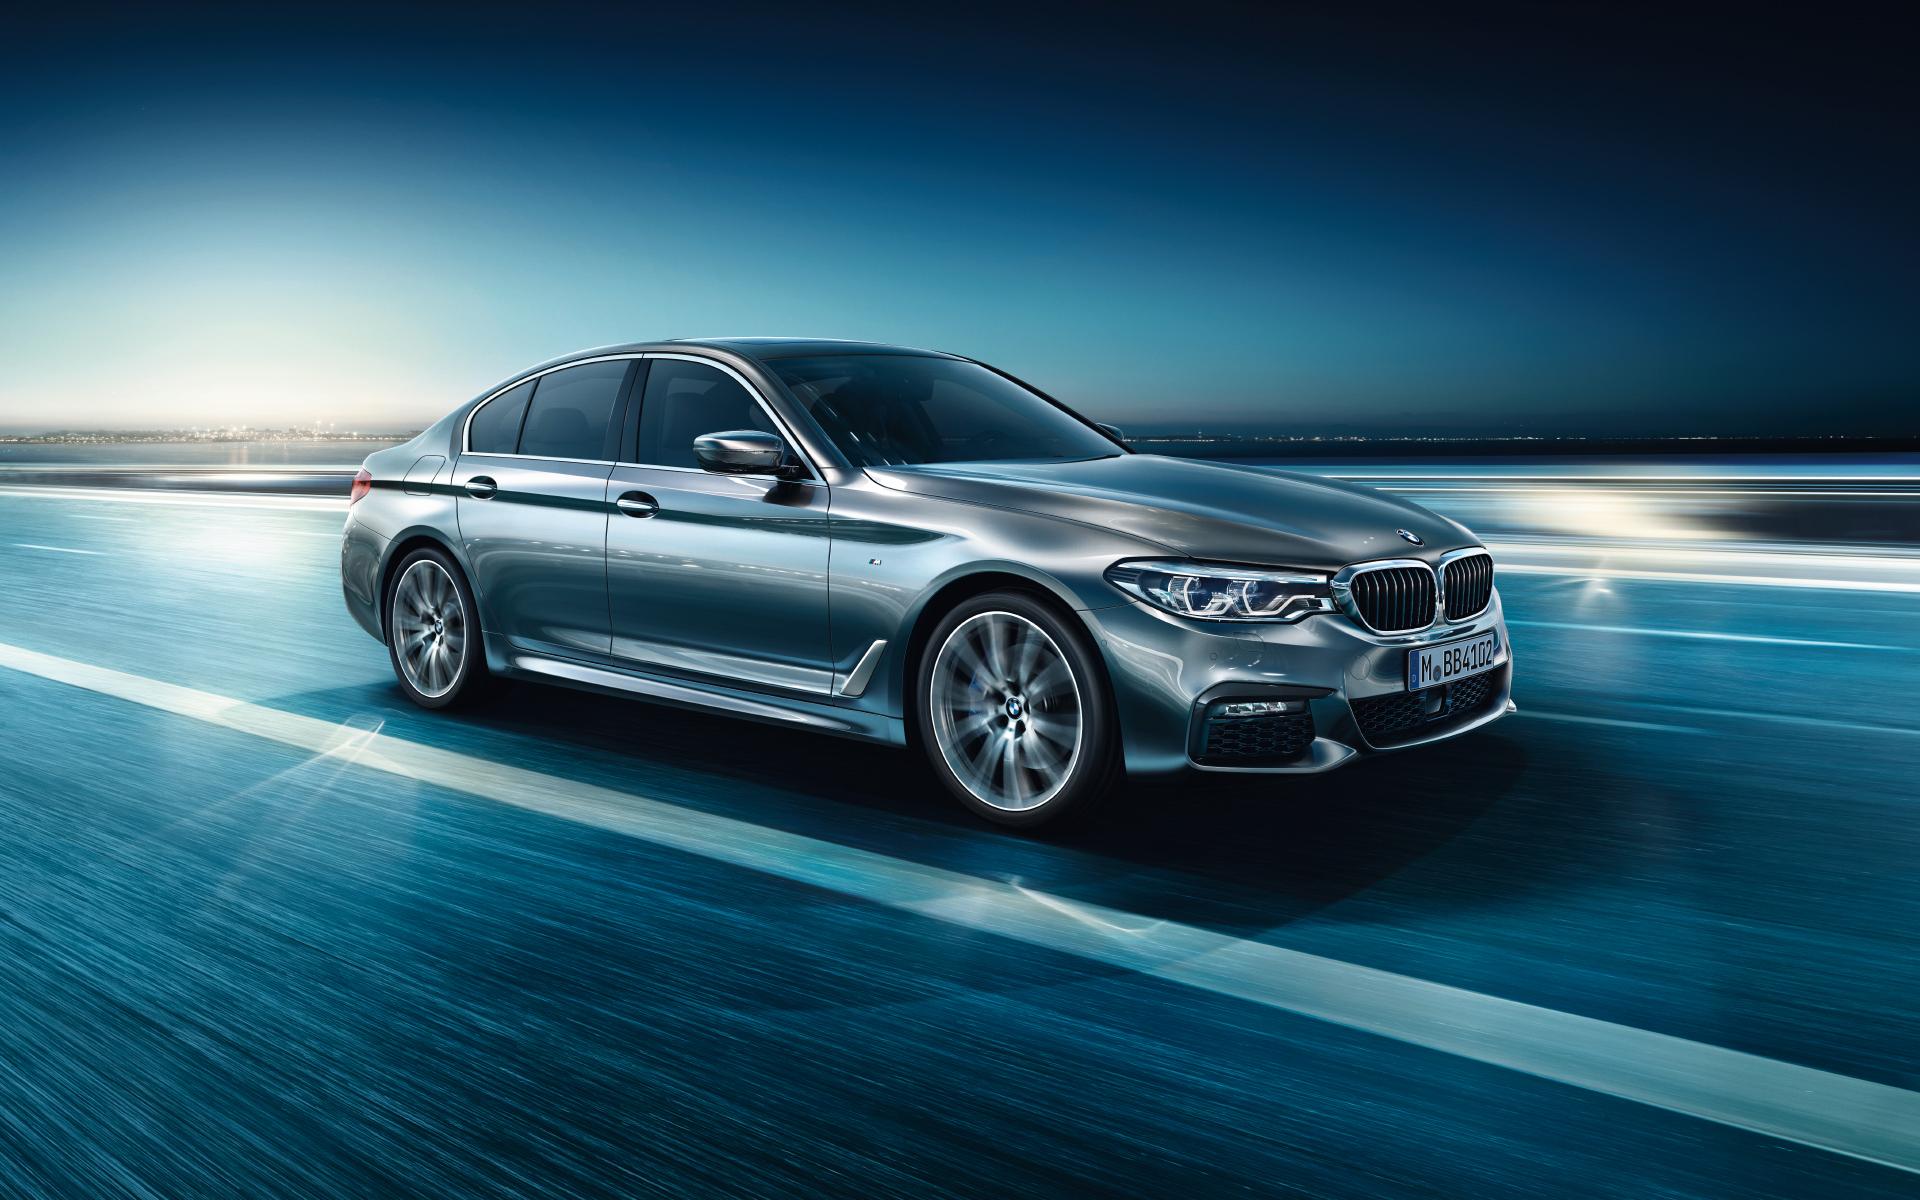 BMW 5series sedan imagesandvideos 1920x1200 01